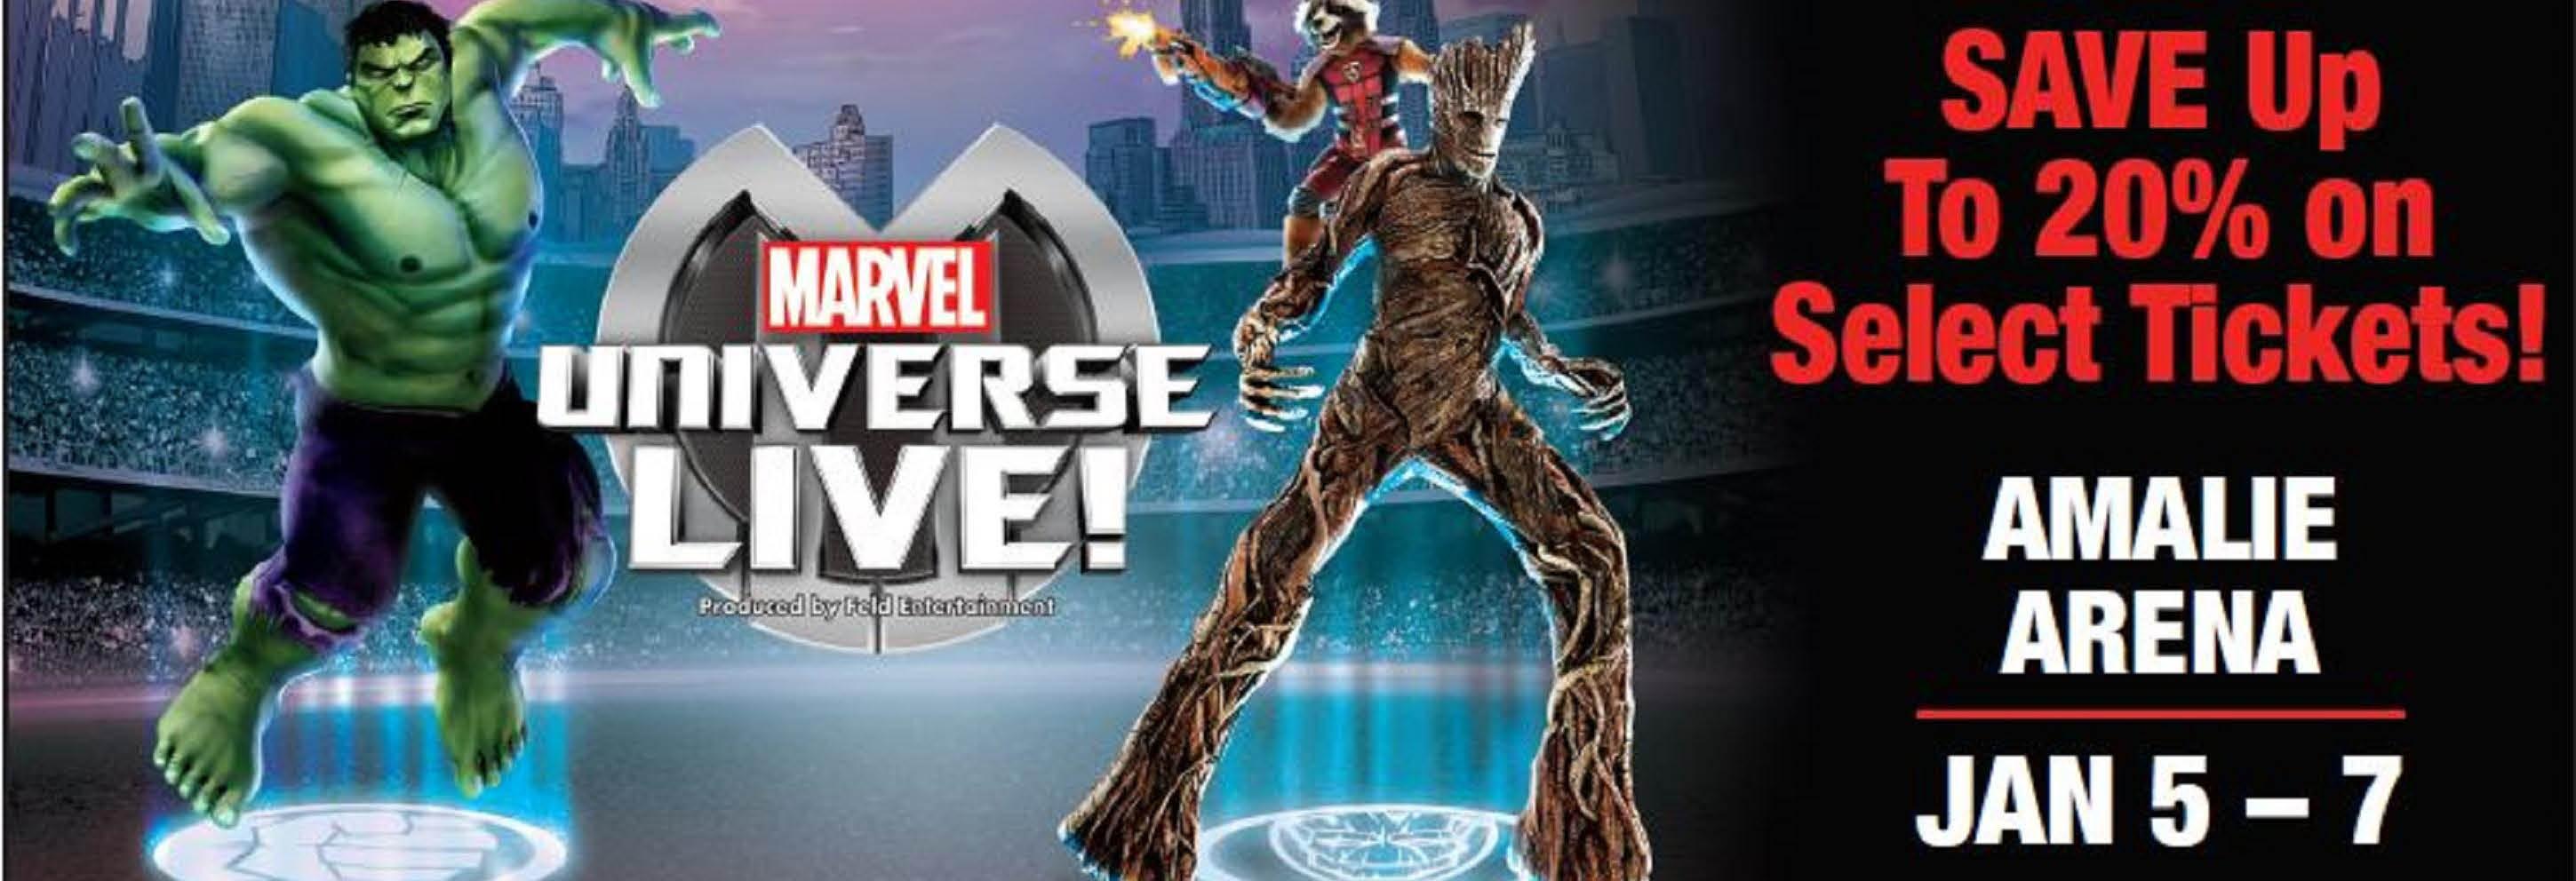 Marvel Universe Live at Amalie Arena in Tampa, FL Banner ad